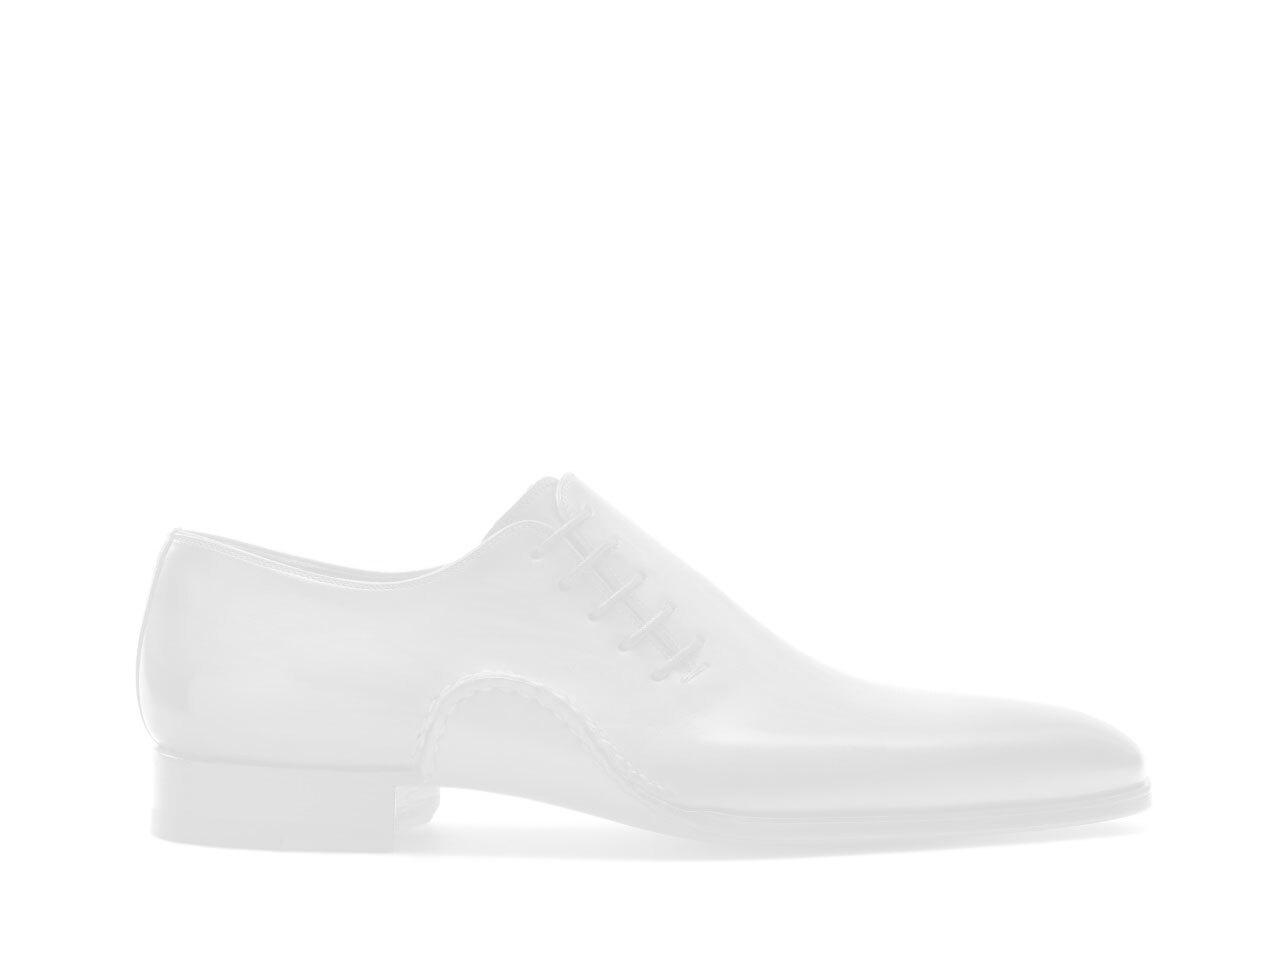 Pair of the Magnanni Echo Lo II Black Men's Sneakers